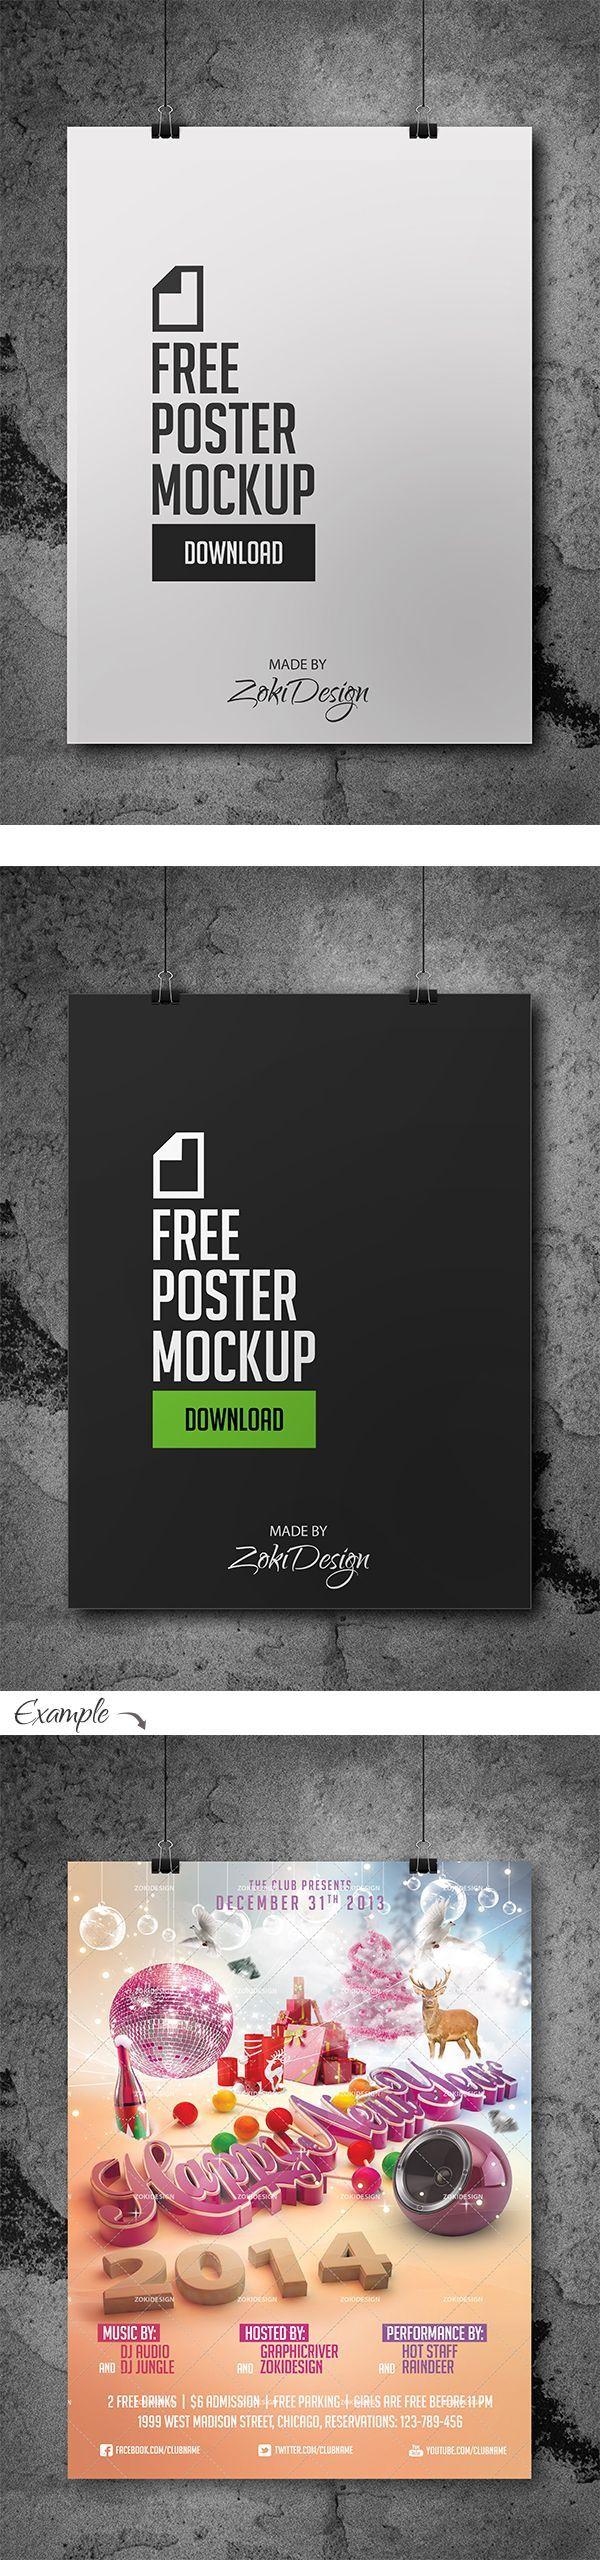 Free Poster Mockup by ZokiDesign, via Behance | Descarga Plantillas ...